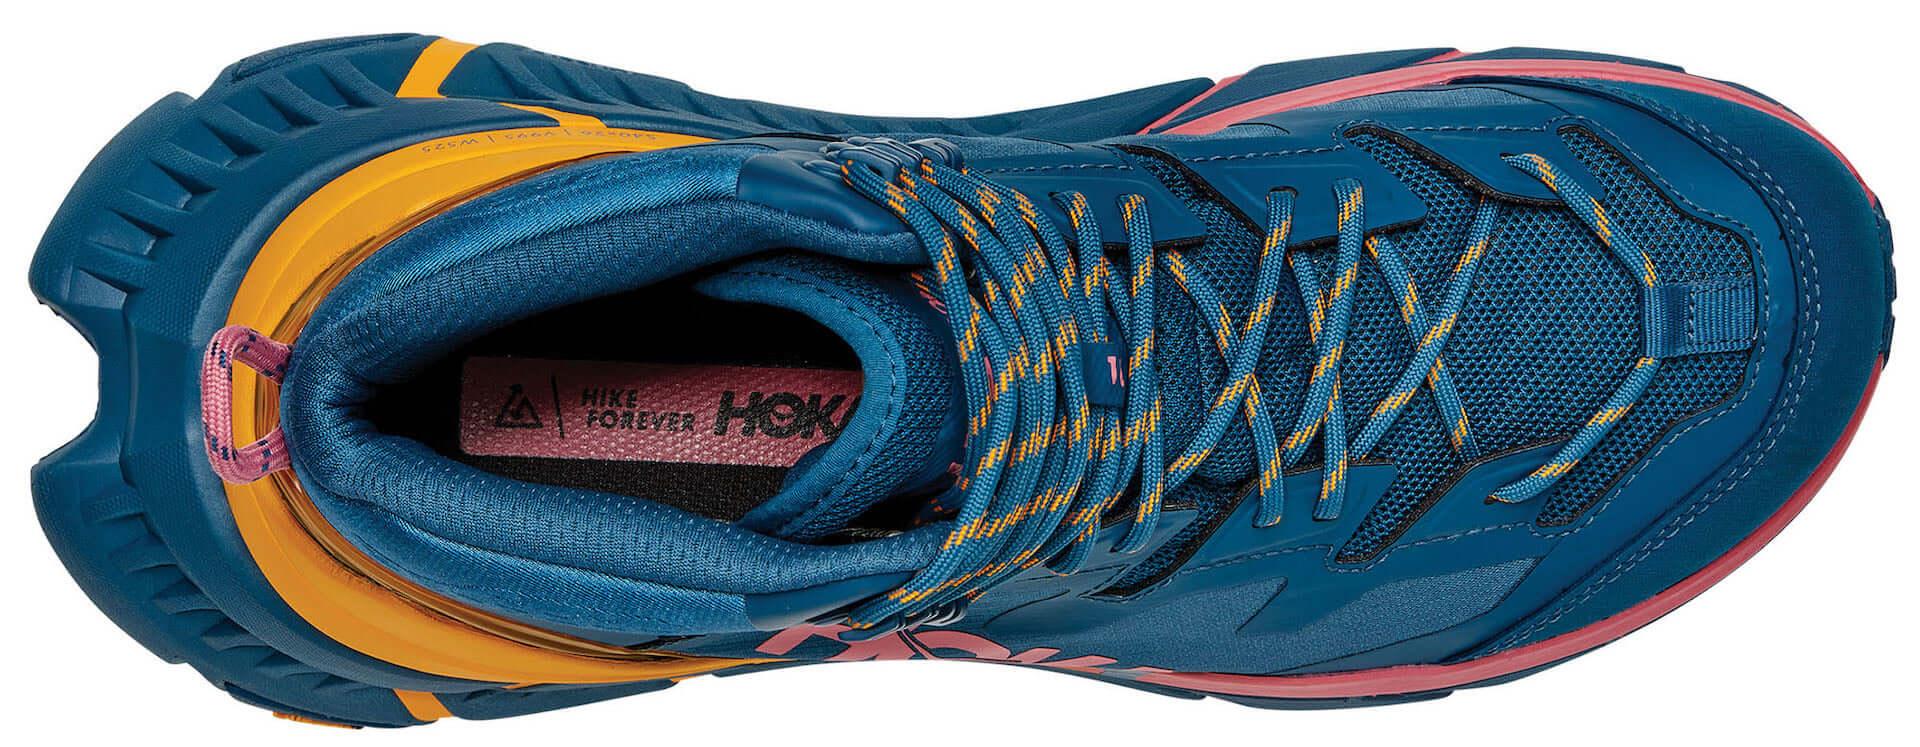 HOKA ONE ONEが防水ハイキングブーツ『TenNine Hike GTX』を発表!リサイクル繊維素材を使用&「GORE-TEX」も搭載 lf201029_hokaoneone_2-1920x747